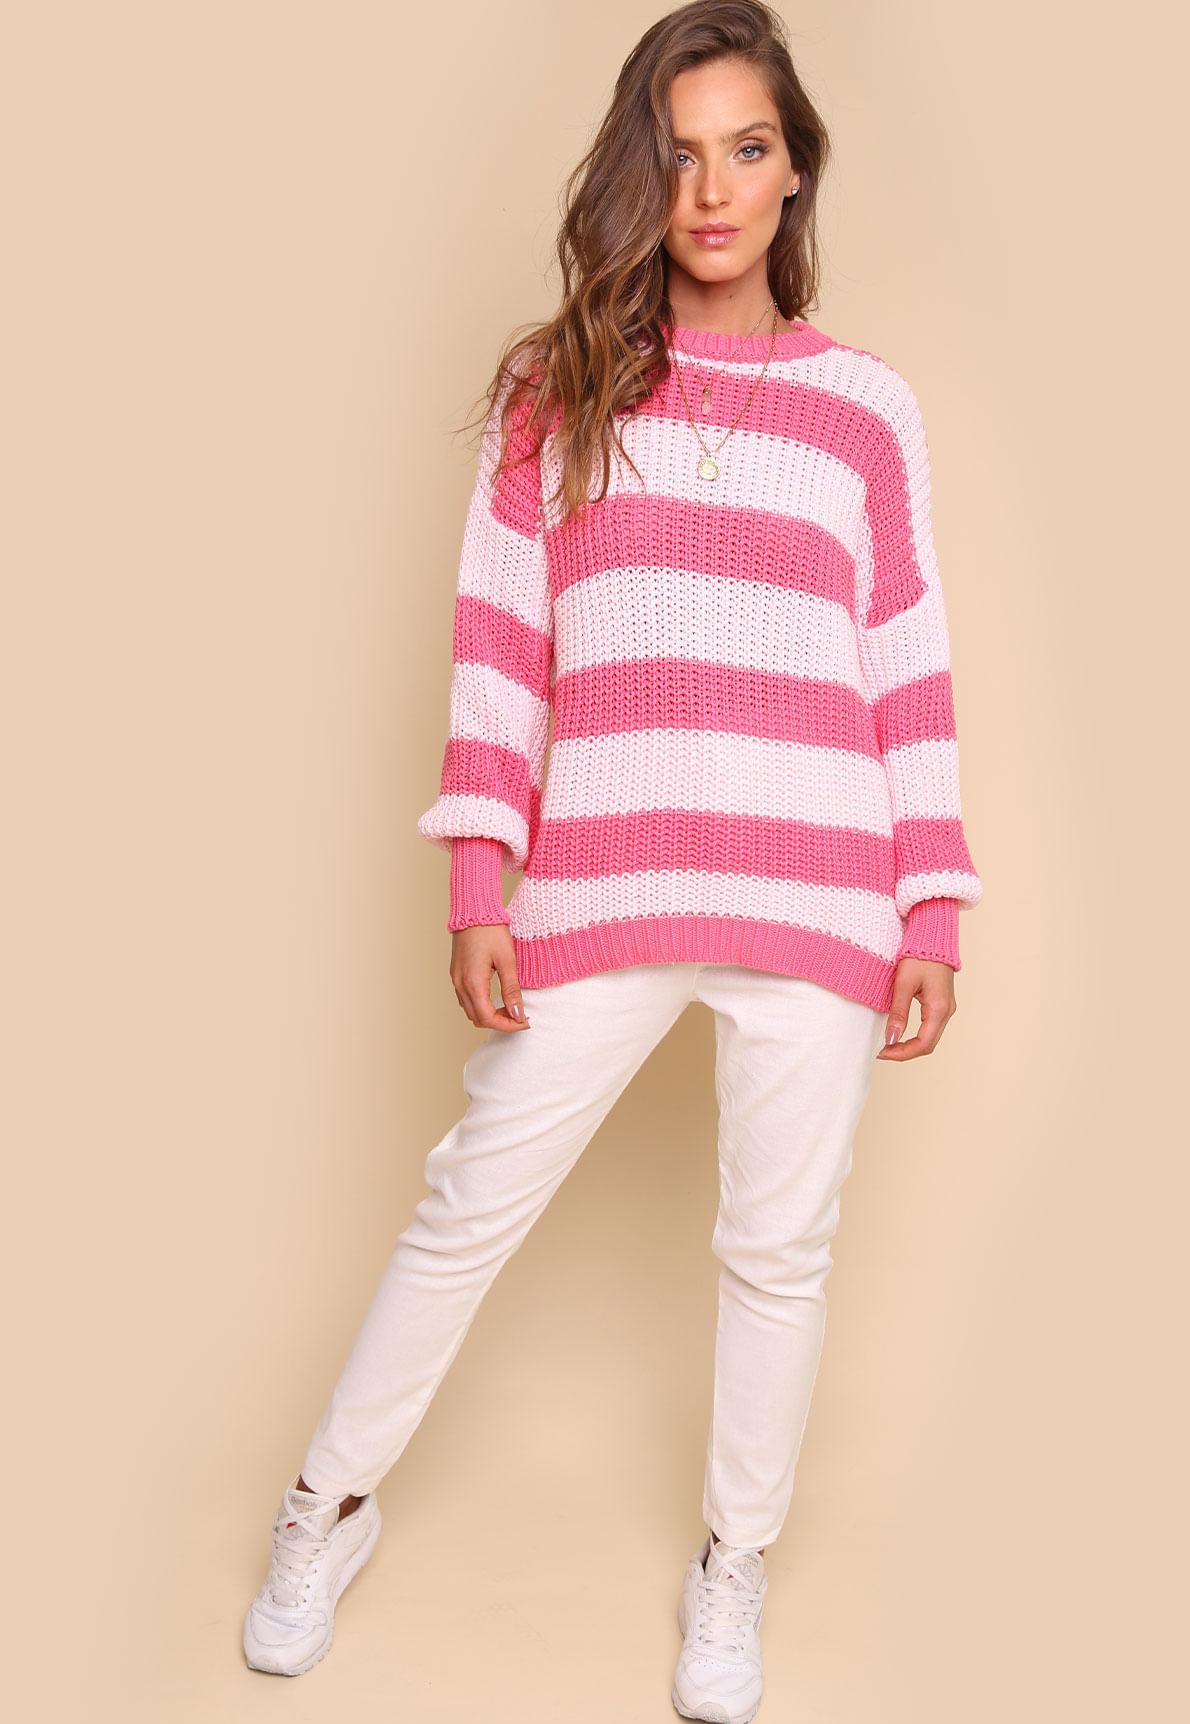 31022-trico-la-vie-en-rose-02